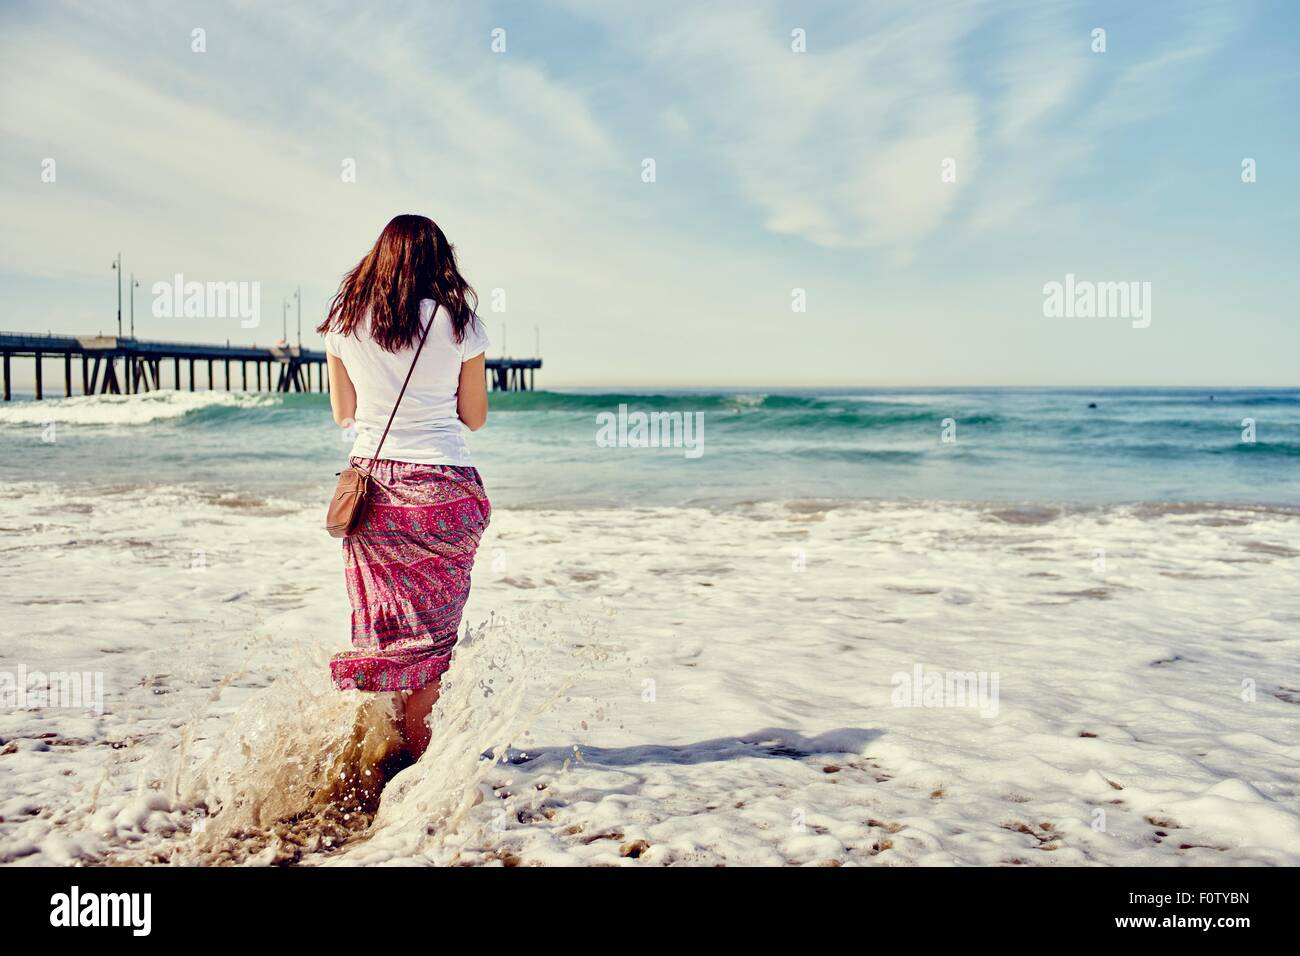 Rear view of woman paddling, Venice Beach, Los Angeles, Californie Photo Stock